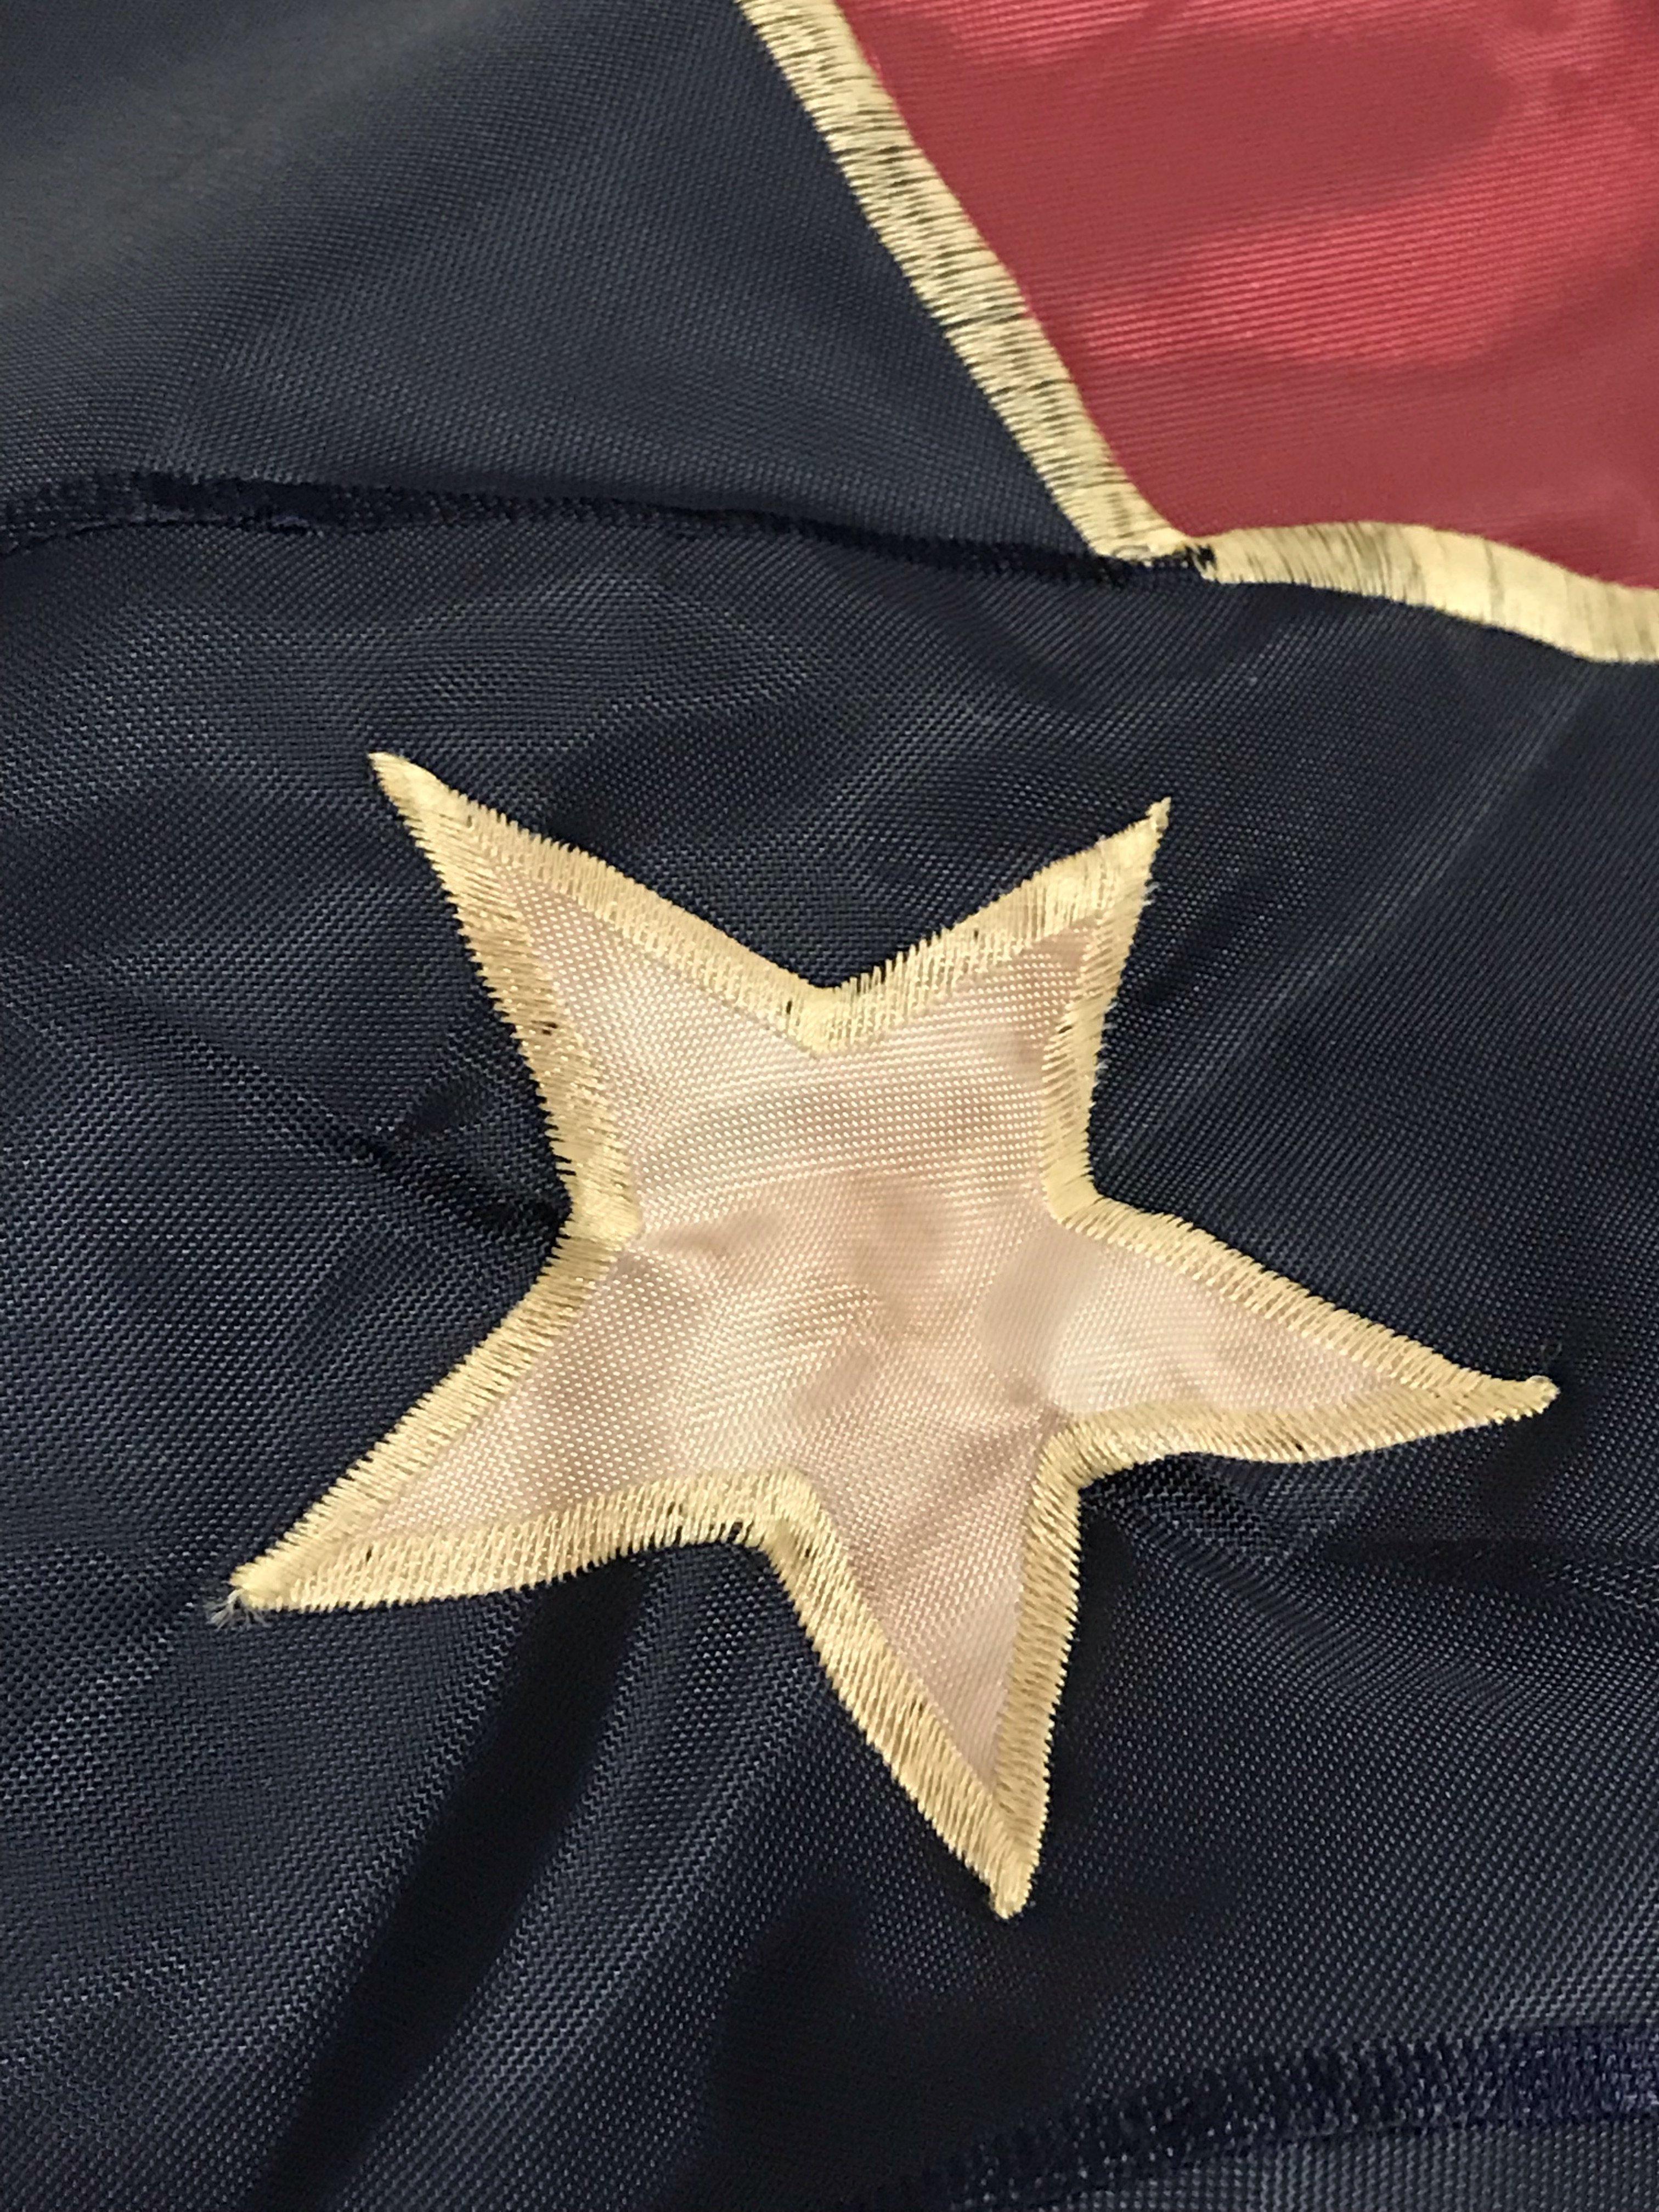 Vintage Sewn Nylon 3x5 Battle Flag